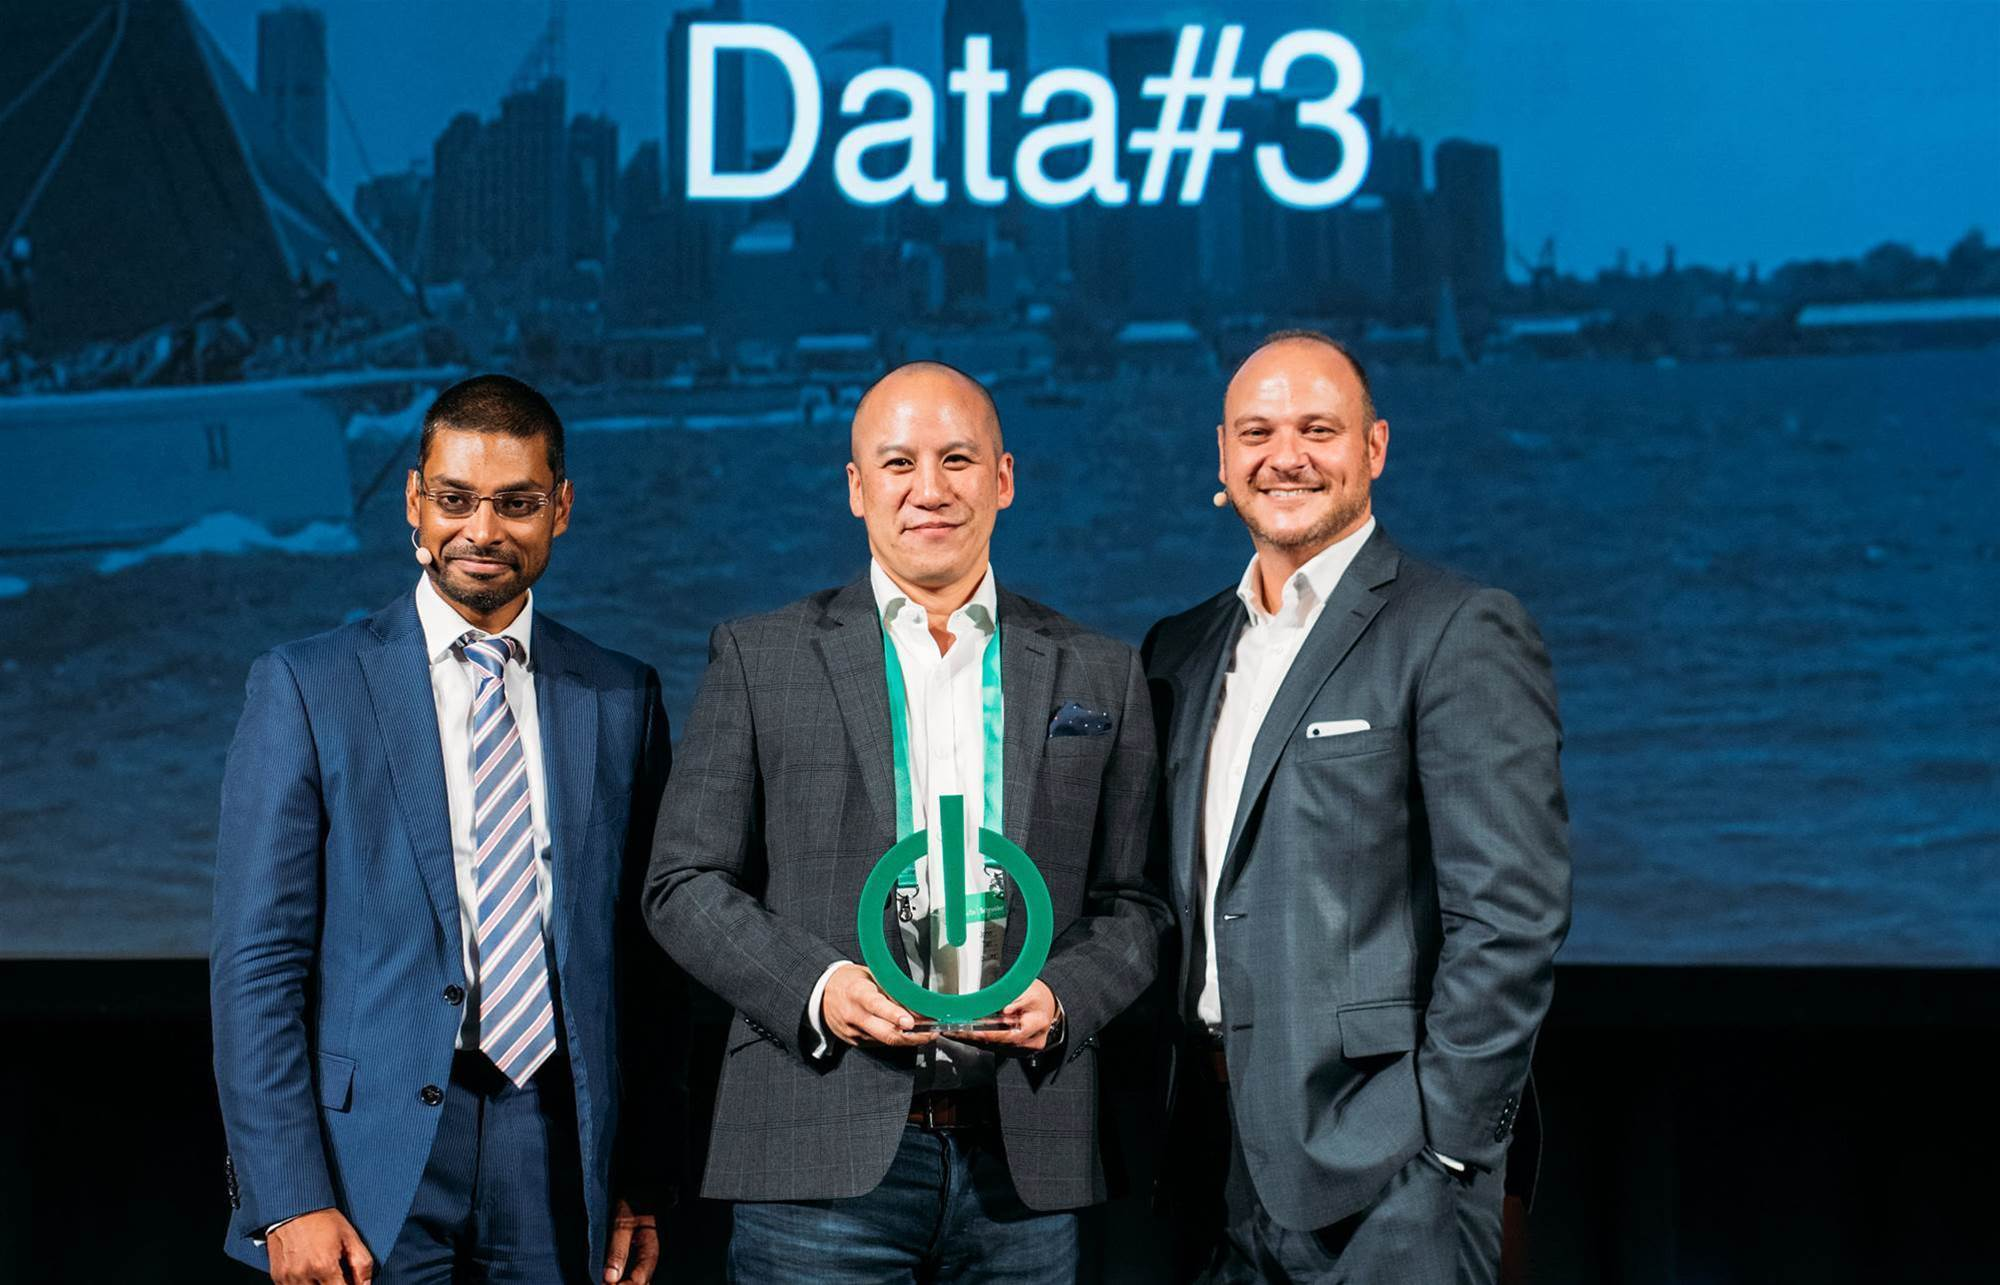 Data#3, Dicker Data, Ingram Micro win top honours from Schneider Electric